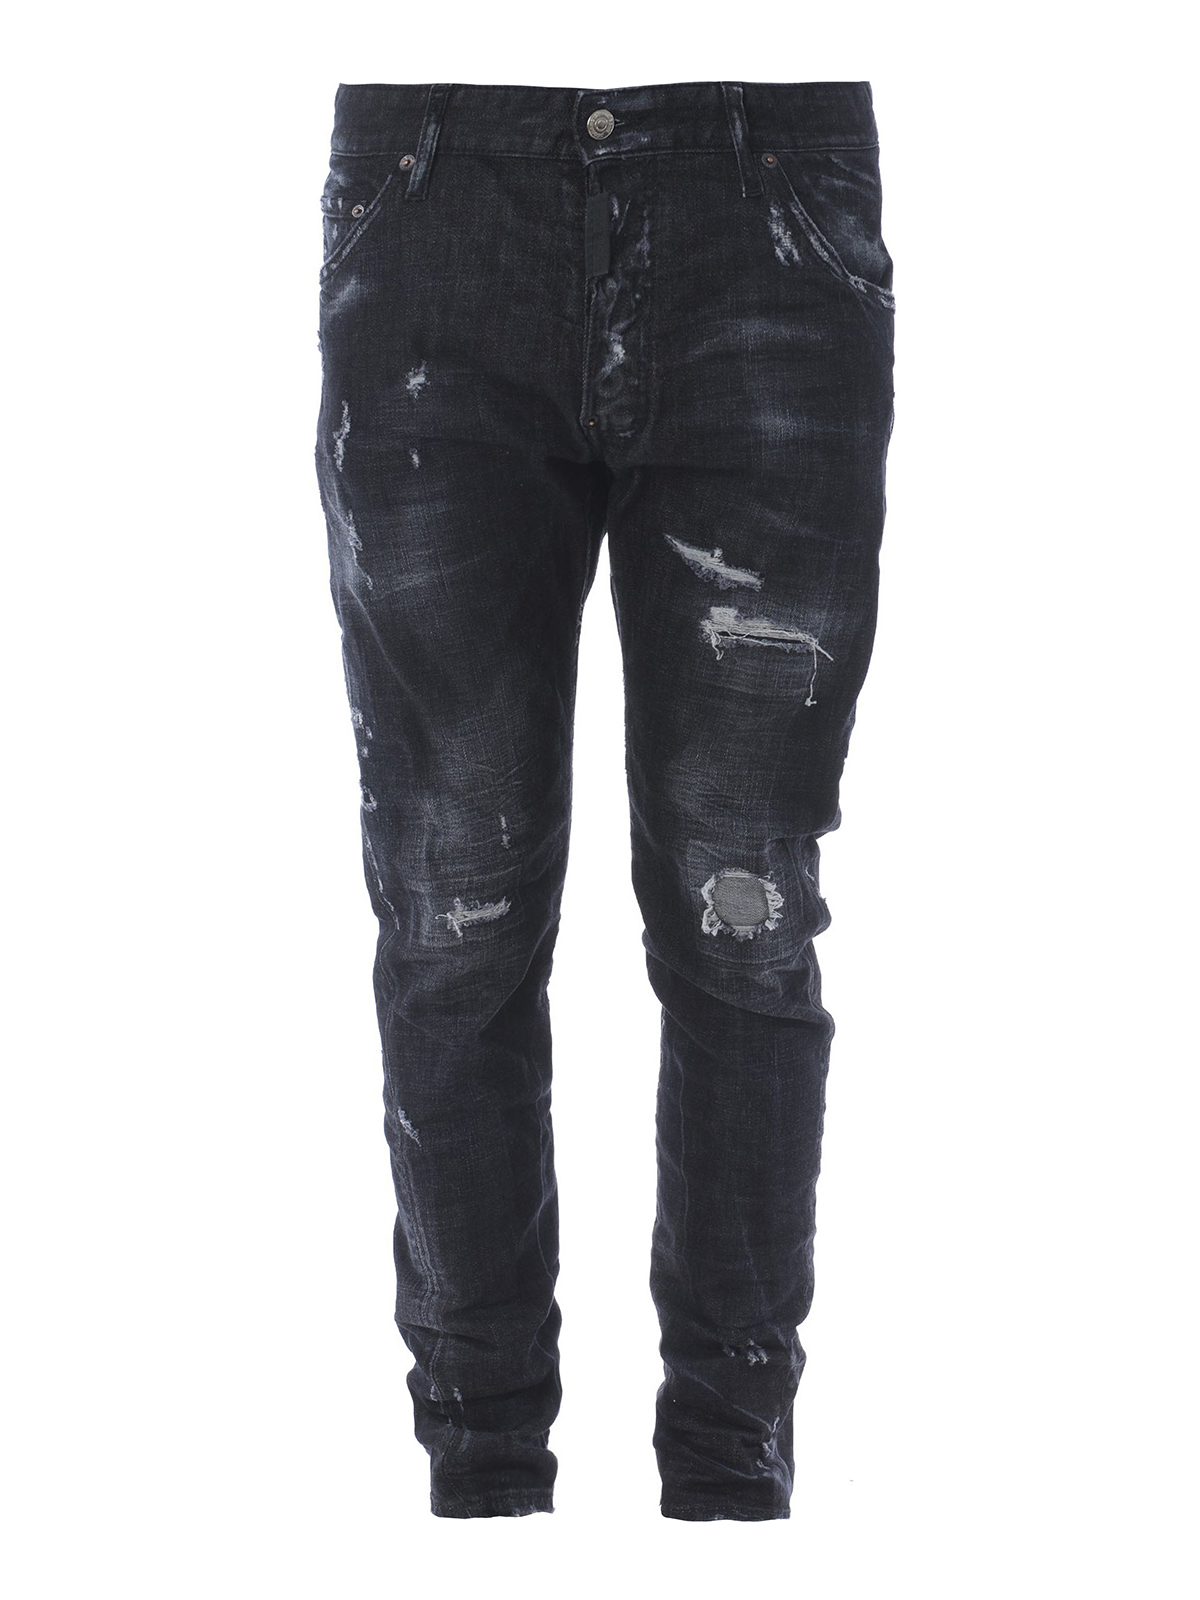 Details about  /Dsquared2 Mens Twin Peaks Classic Kenny Jeans Worn Effect Cotton Blend Denim